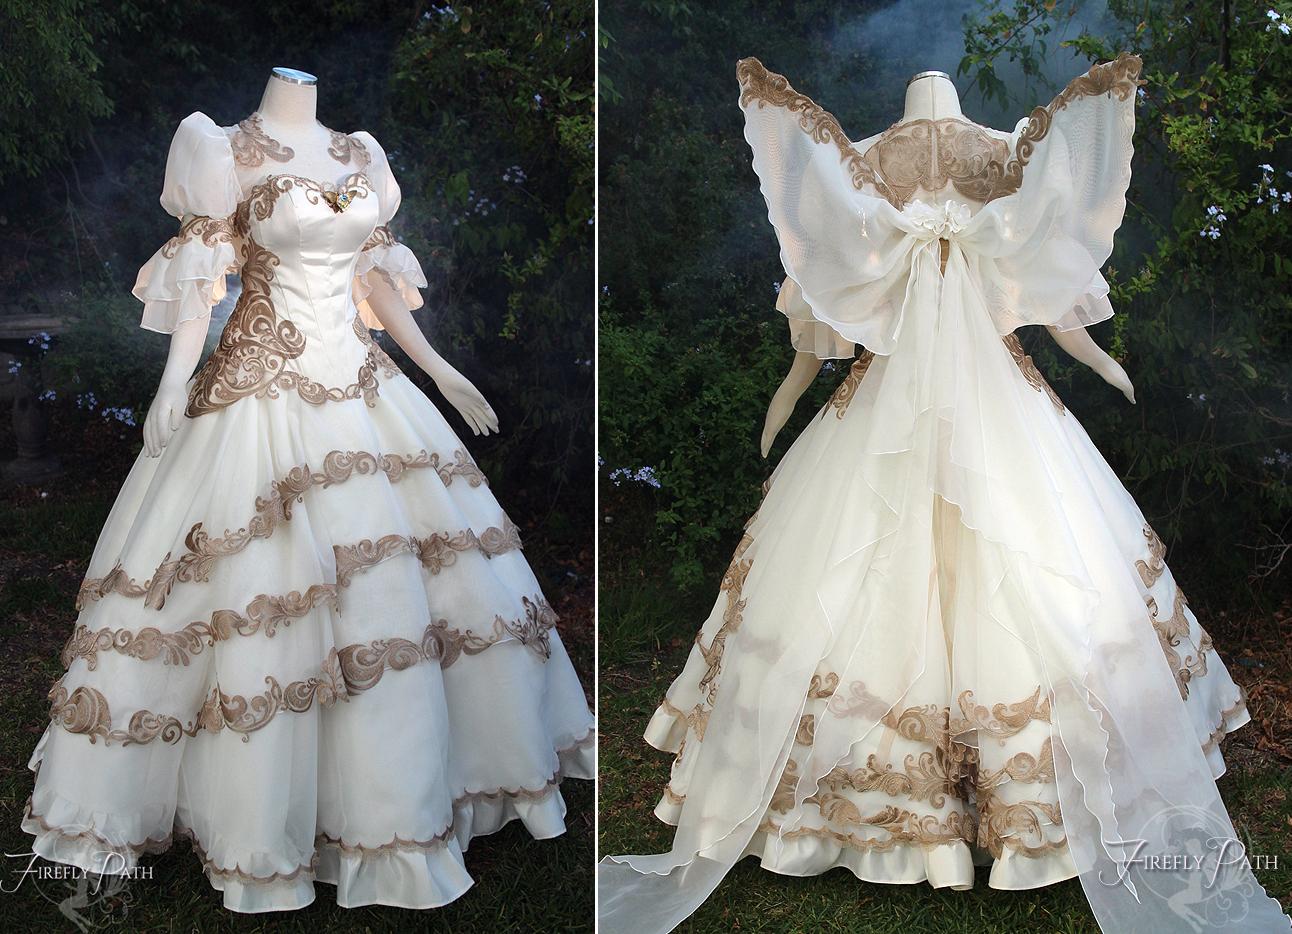 Tsubasa chronicles bridal dress by firefly path on deviantart for Legend of zelda wedding dress